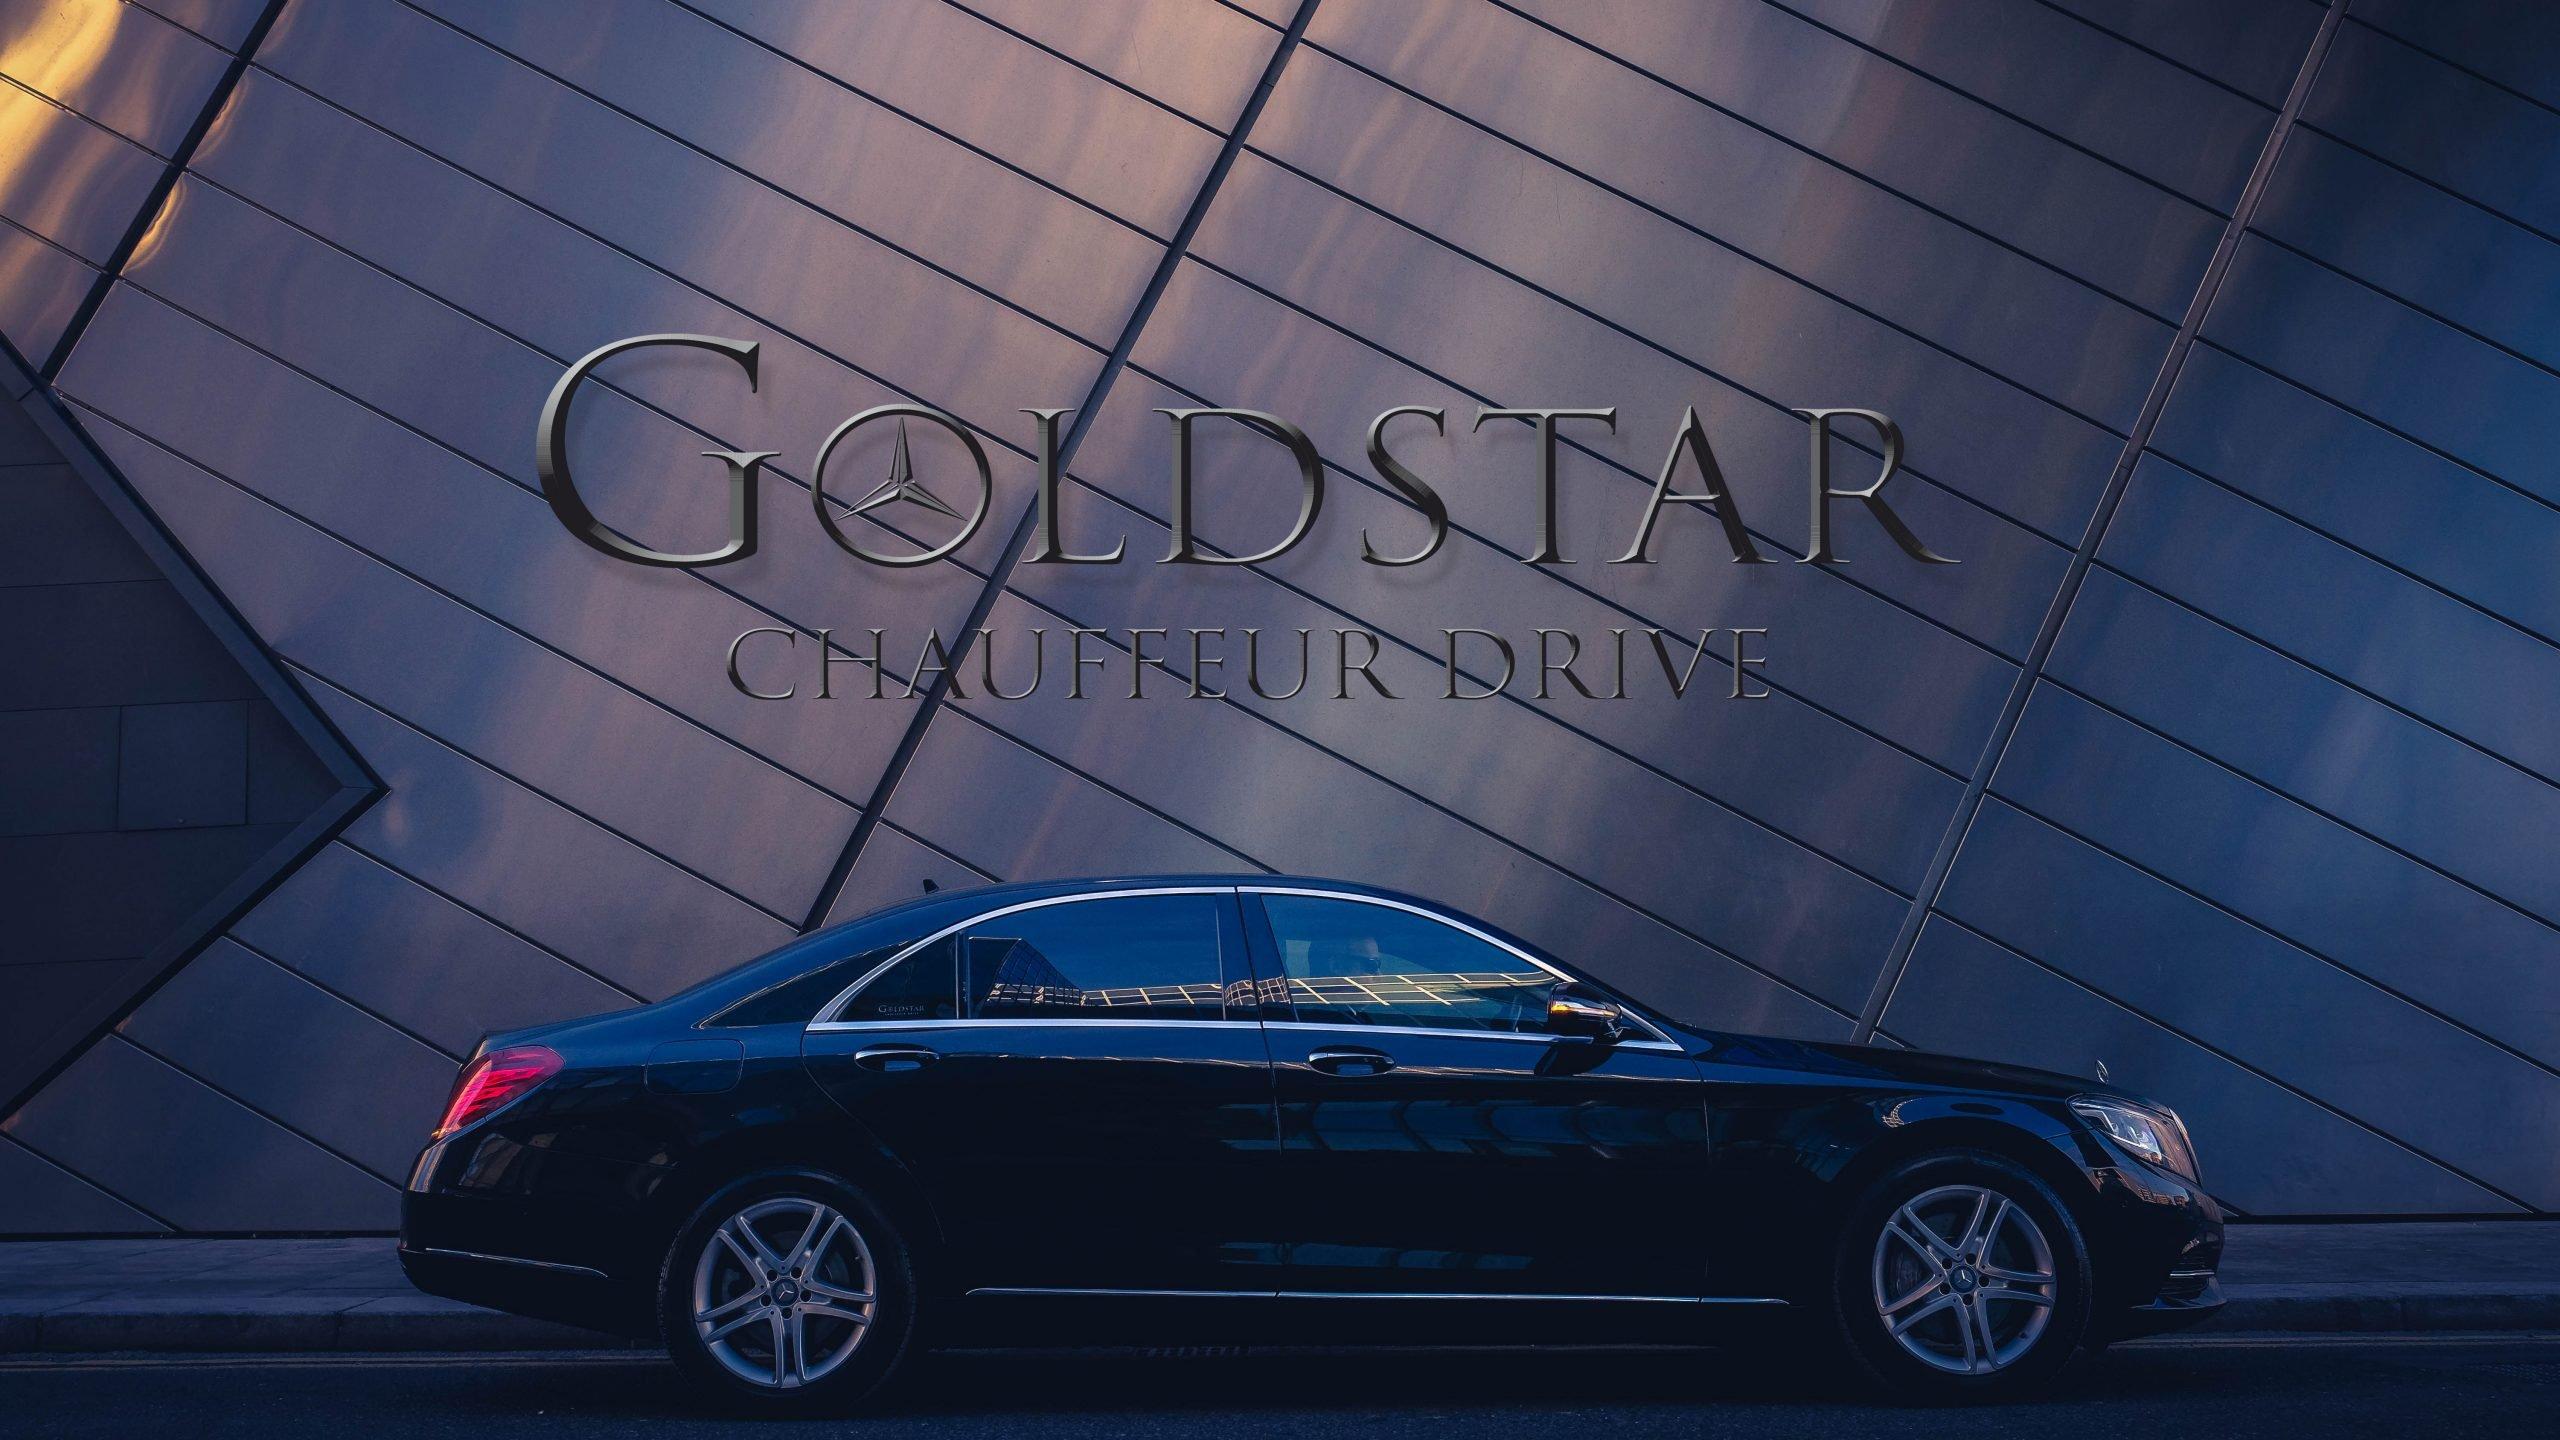 Goldstar thumb